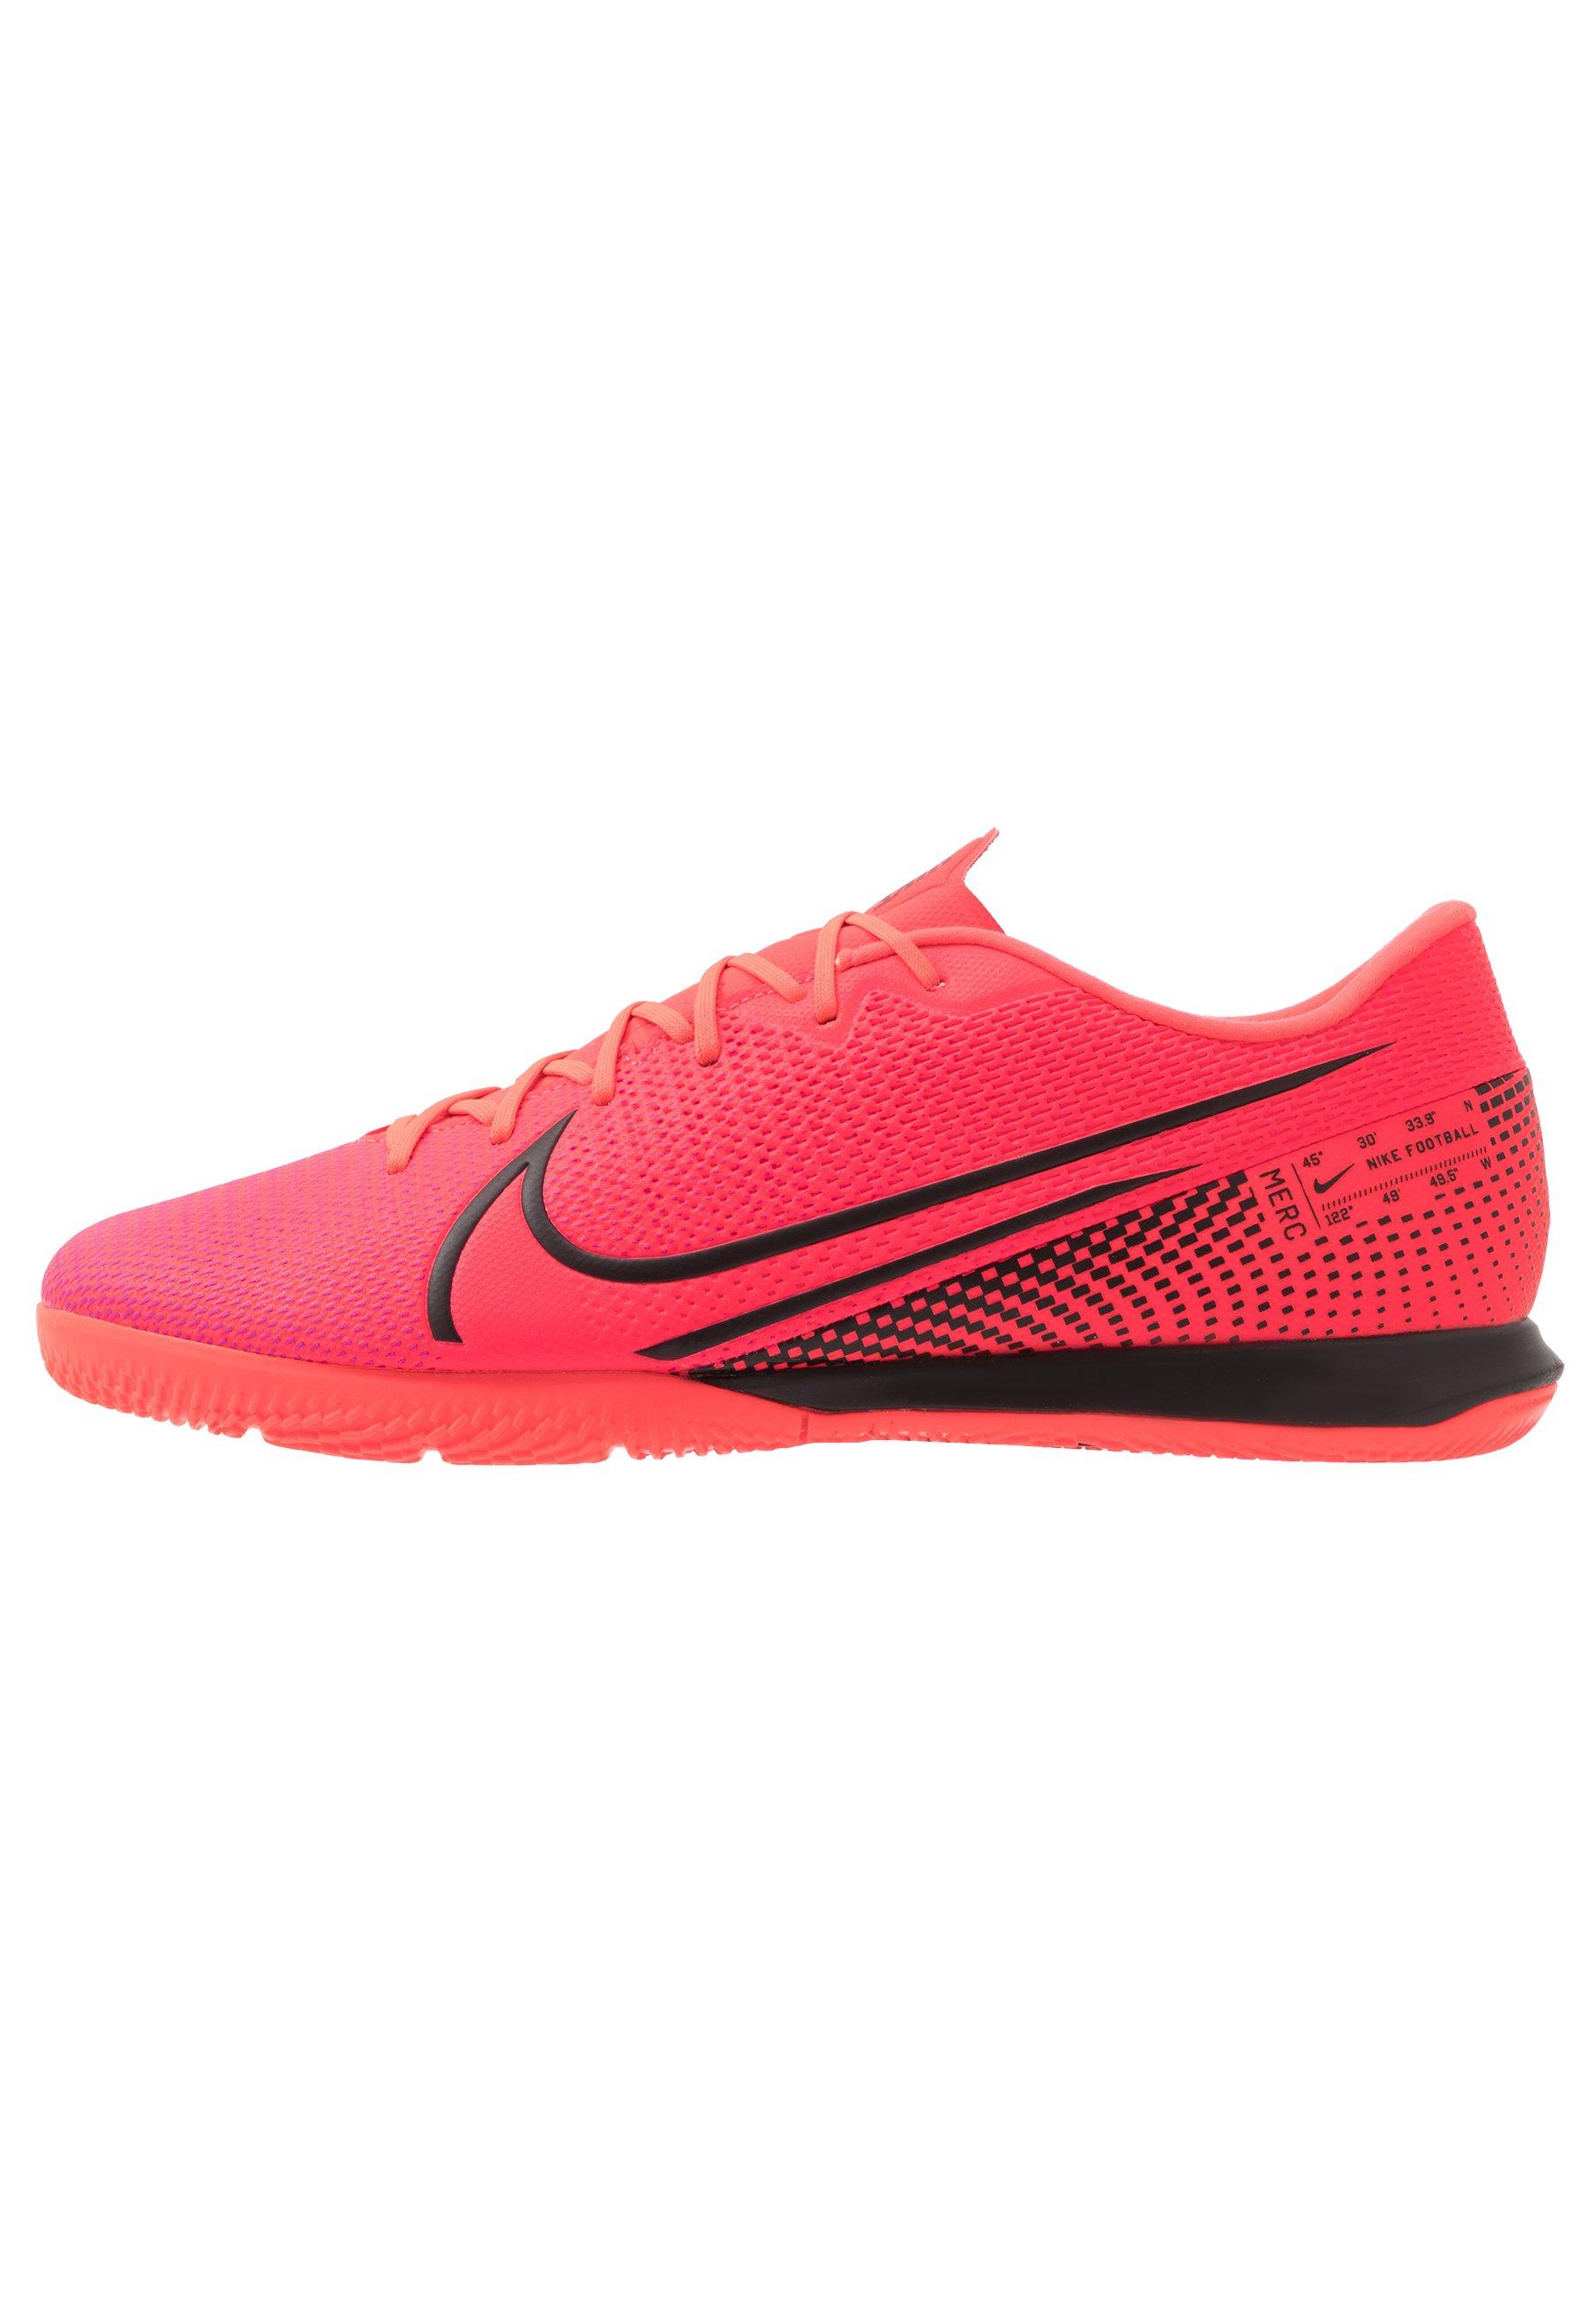 Nike Performance Mercurial Vapor 13 Academy Ic - Fotbollsskor Inomhusskor Laser Crimson/black